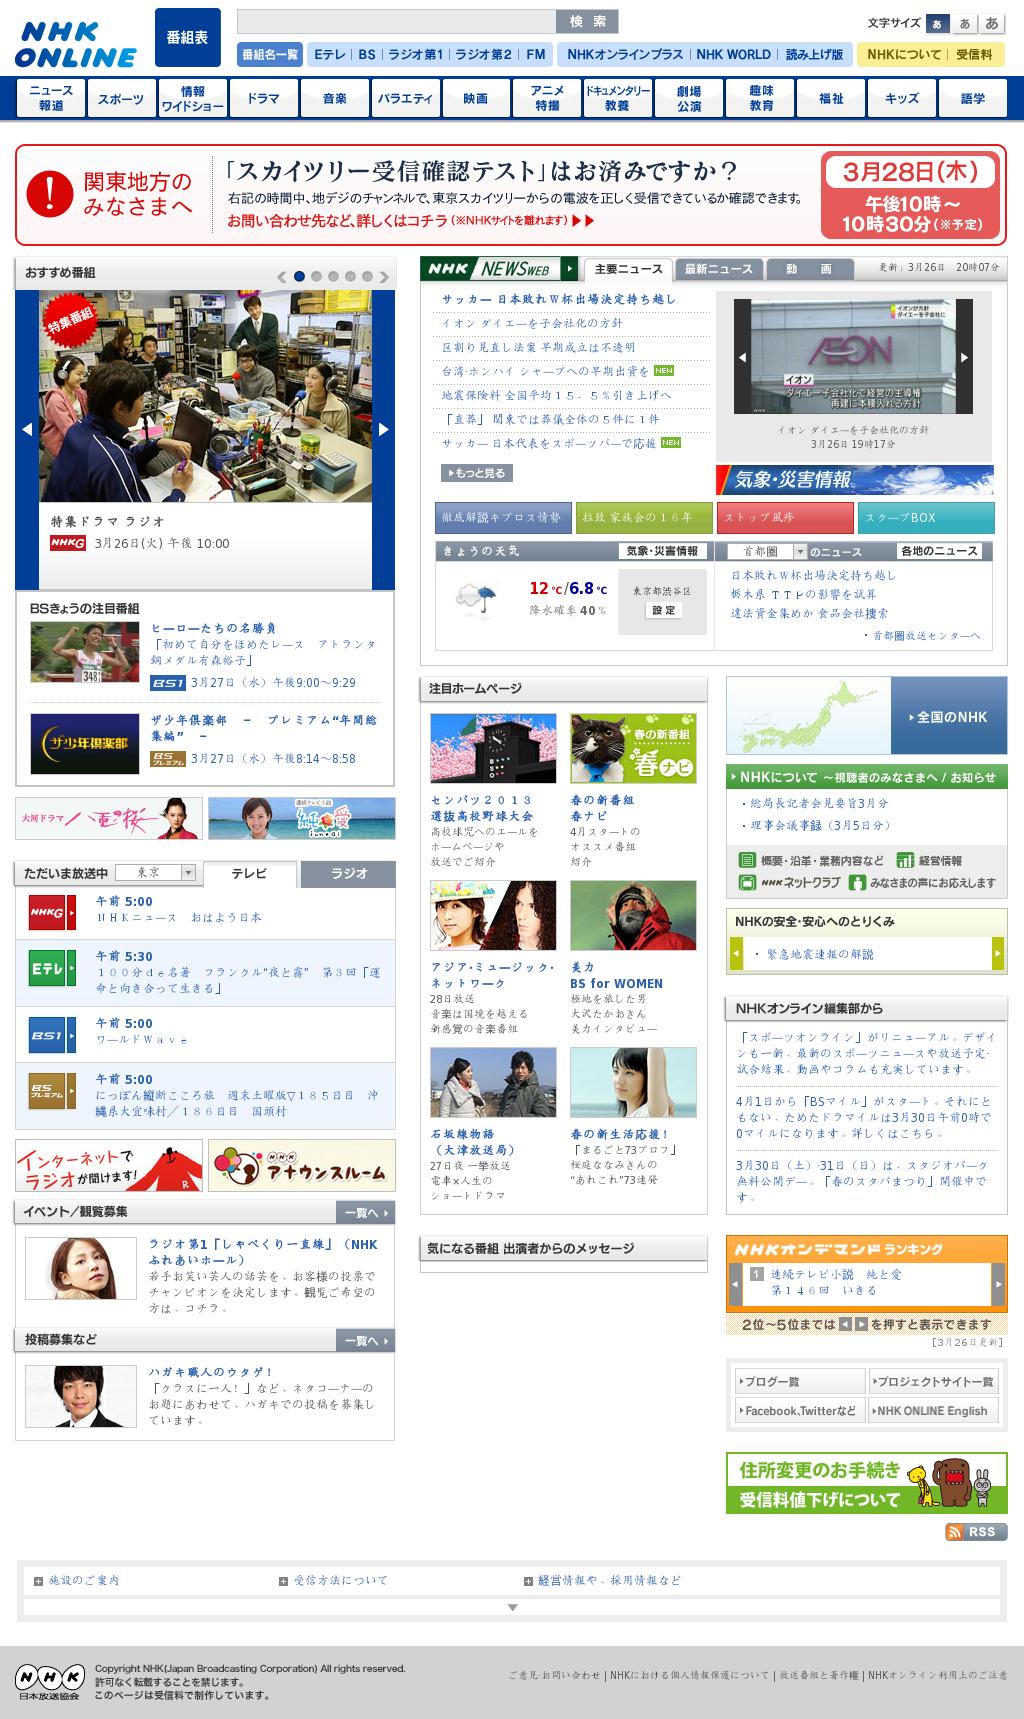 NHK Online at Tuesday March 26, 2013, 8:31 p.m. UTC